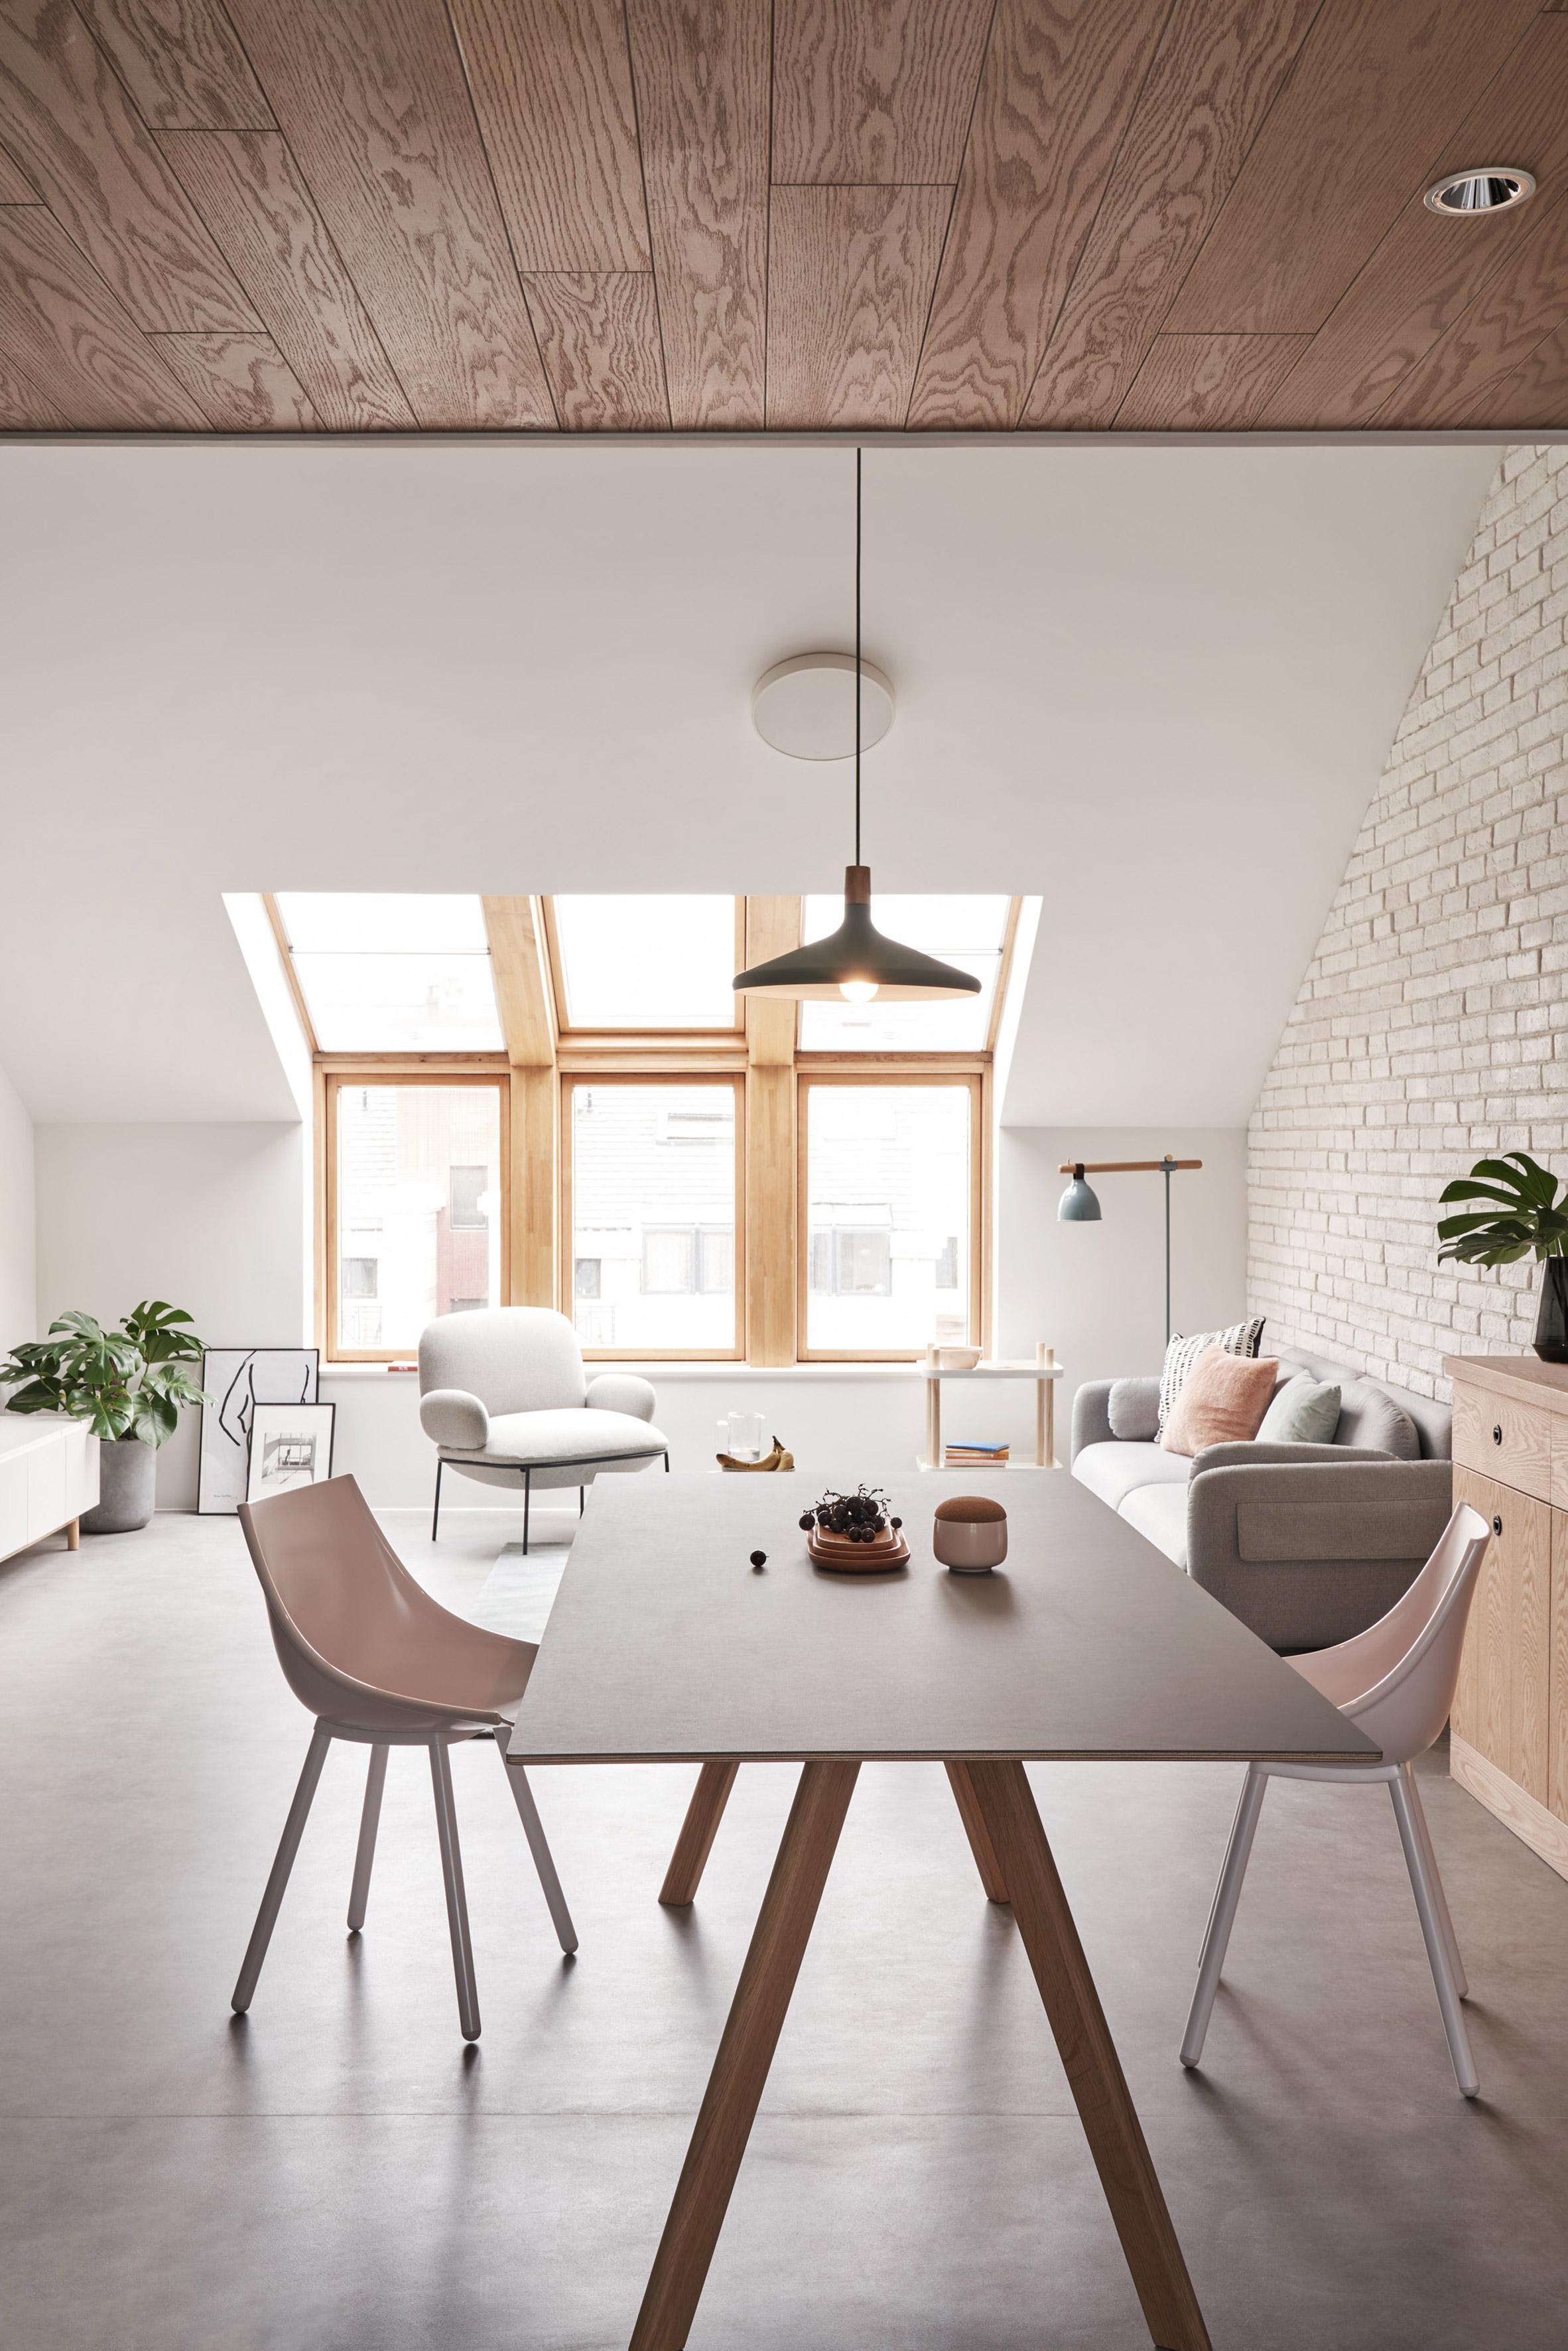 căn hộ cho gia đình trẻ starburst-house-hao-design-interiors-residential-china-beijing-elledecoration vietnam 4